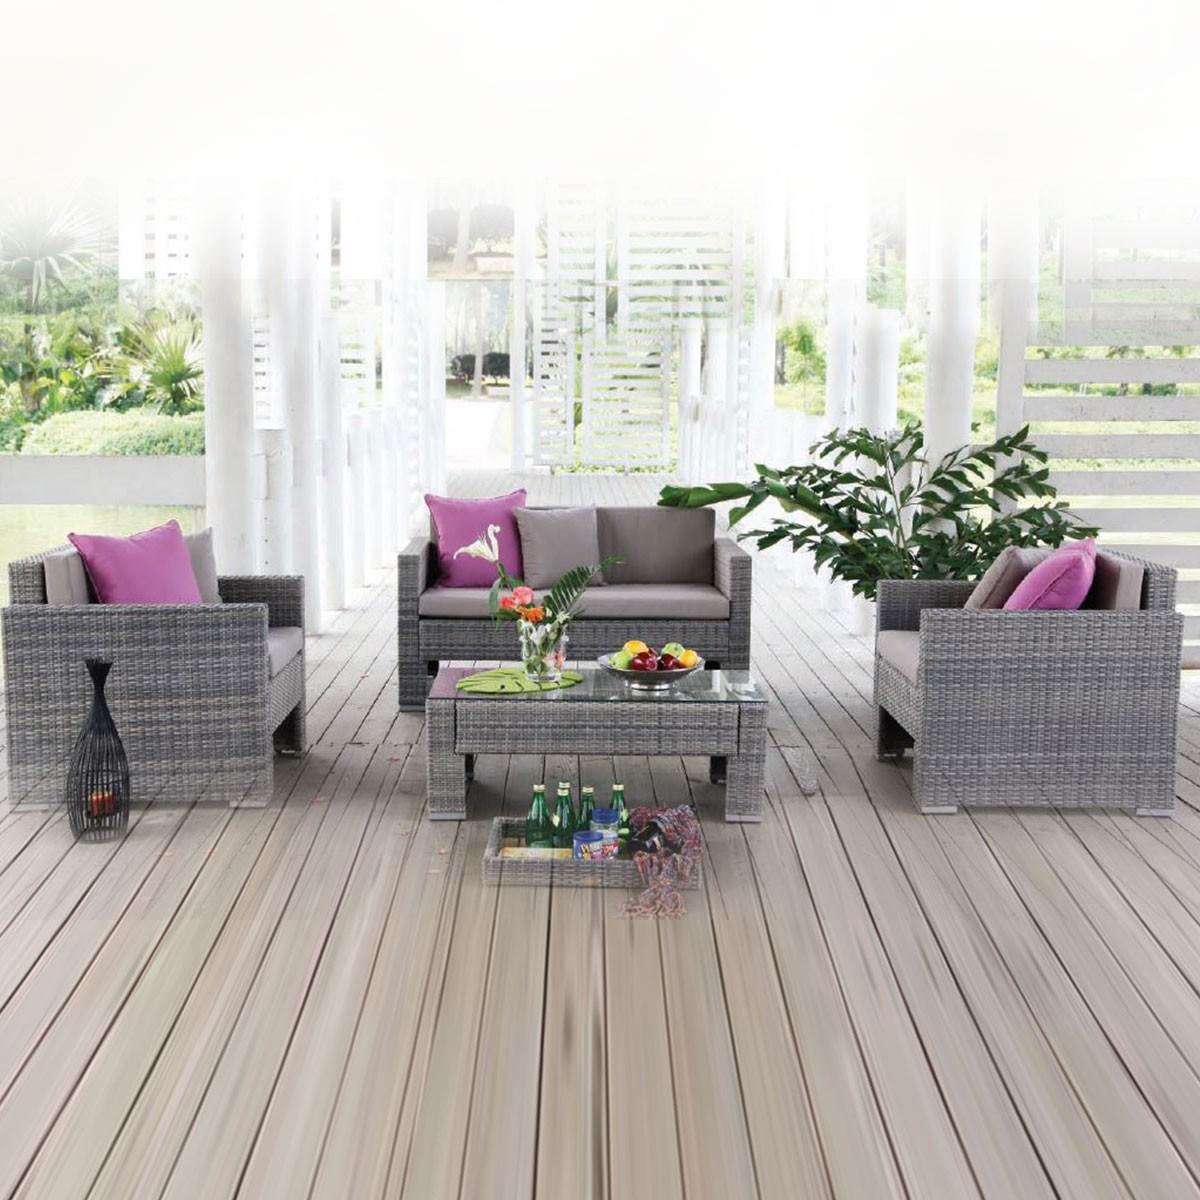 4-Piece PE Rattan Sofa Set: Loveseat, 2 Lounge Chairs, Coffee Table (LLS-P36)